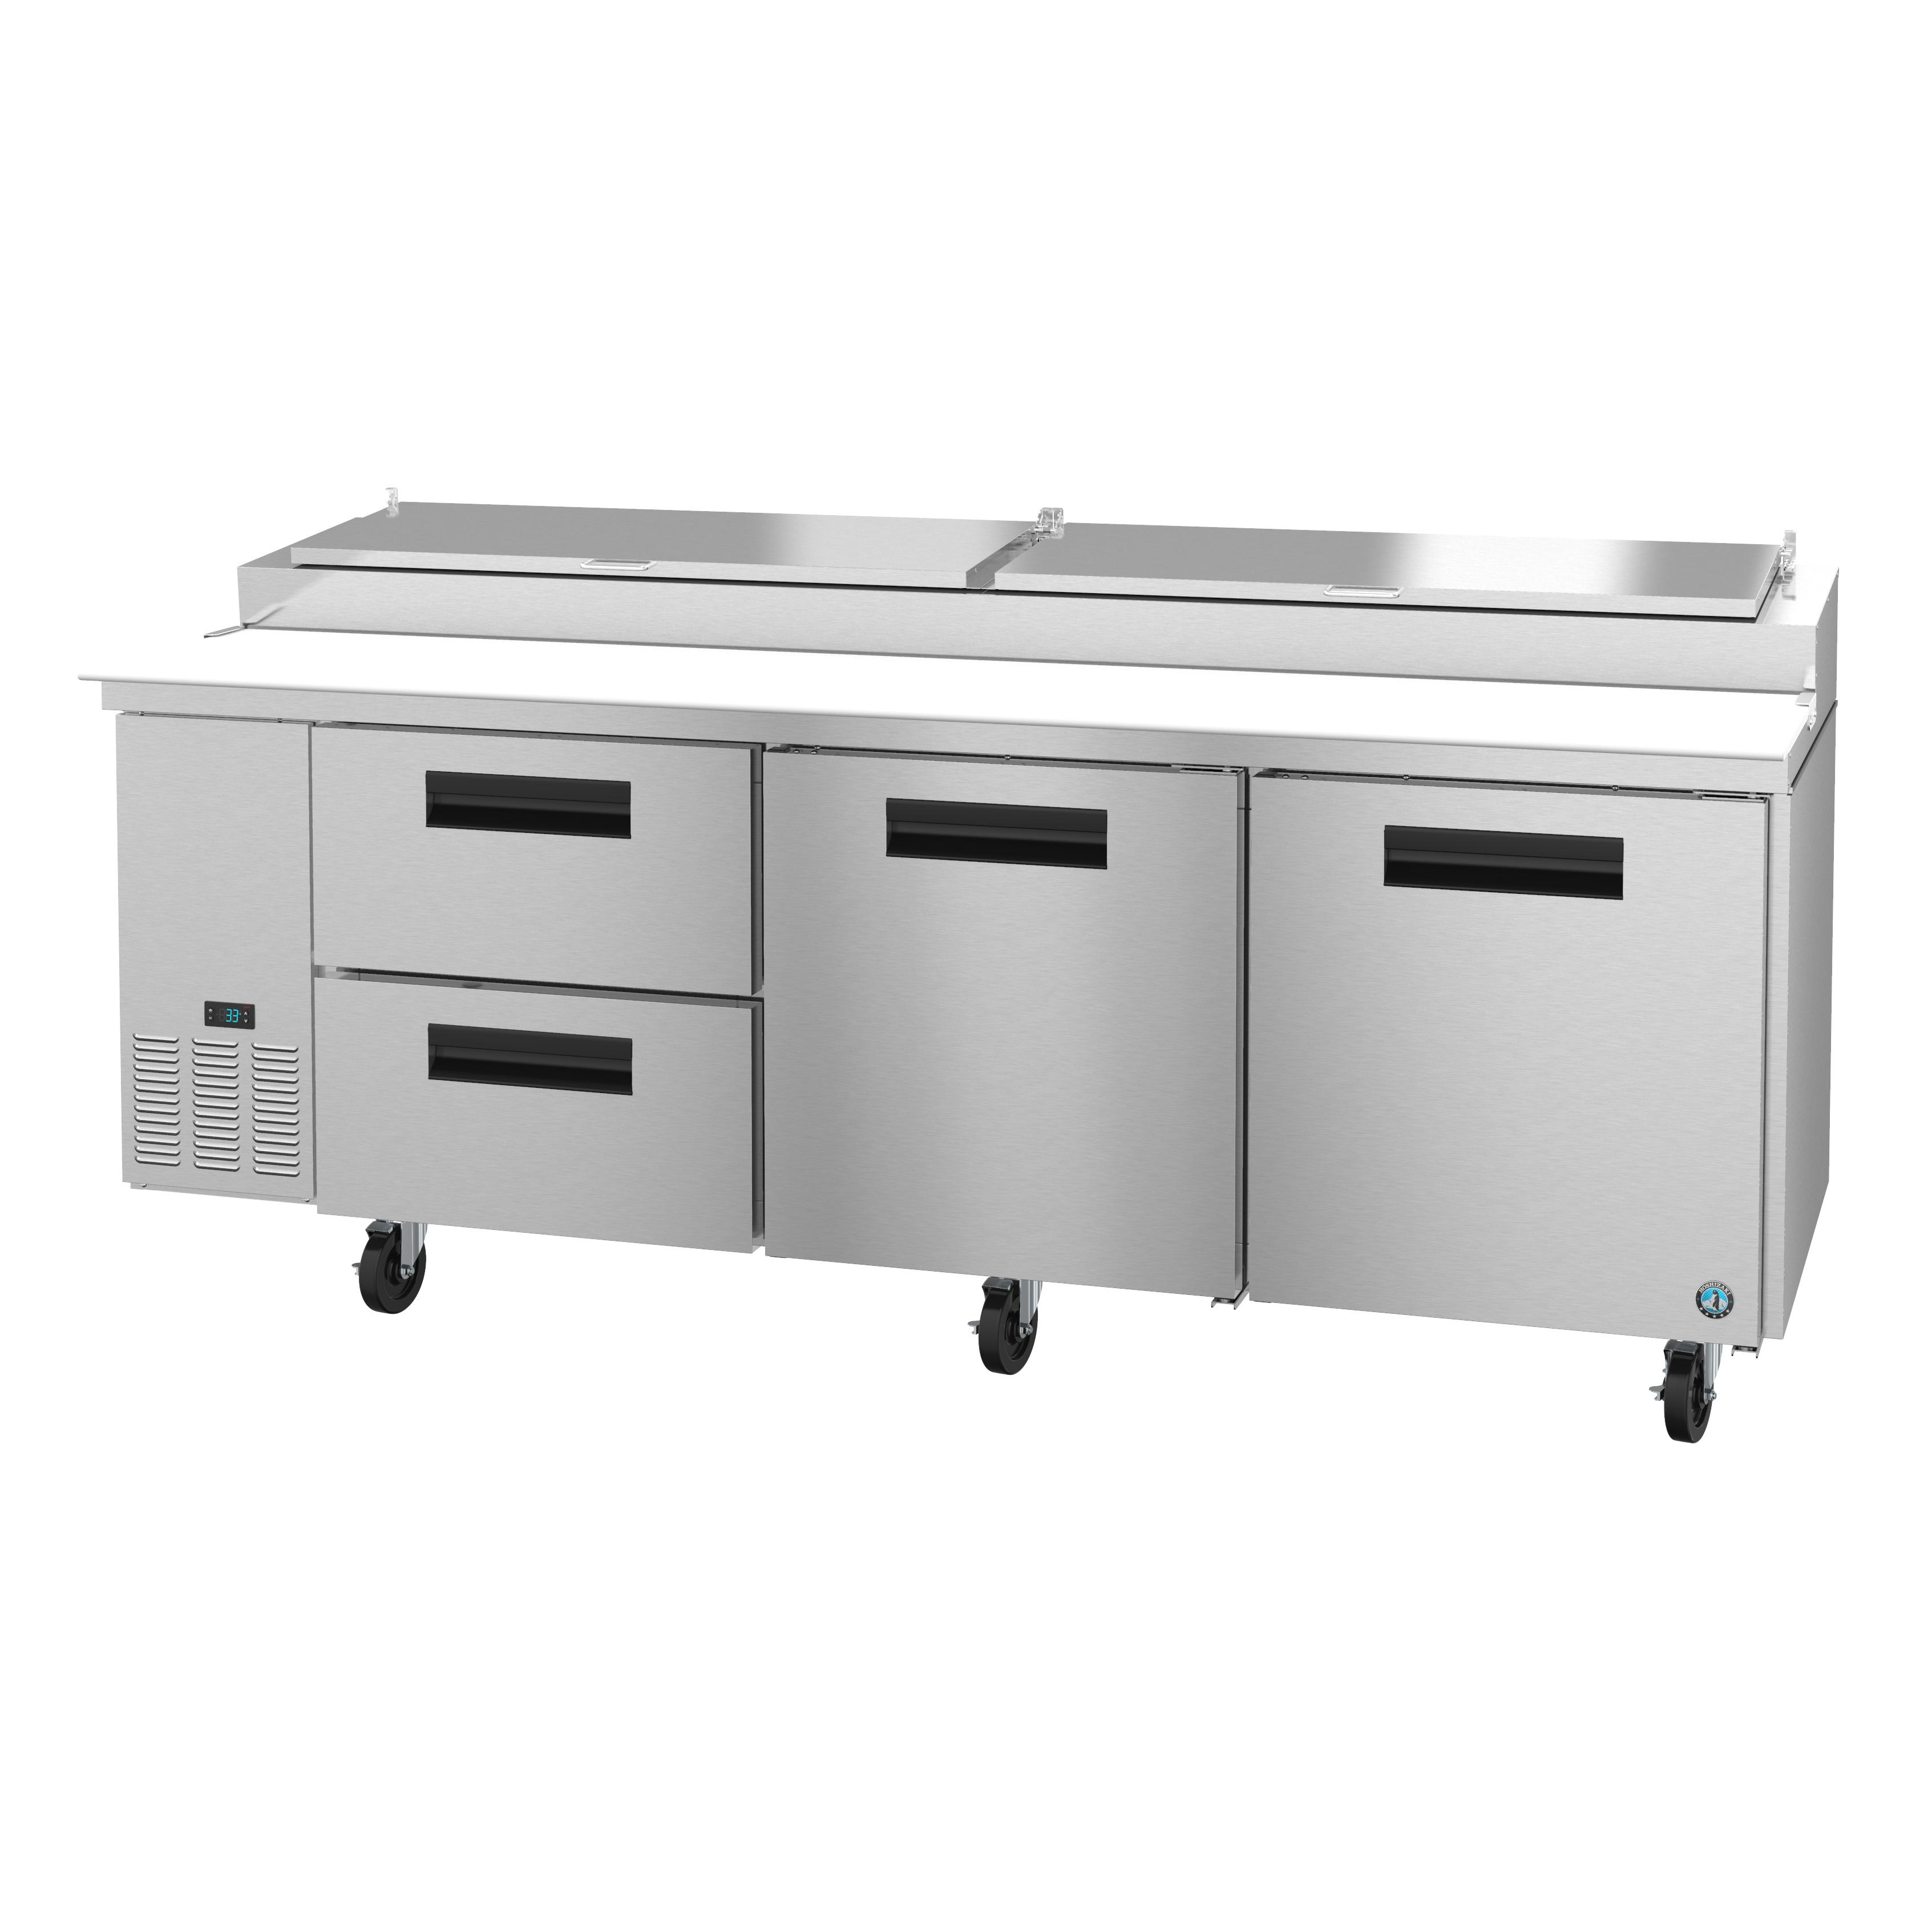 Hoshizaki PR93A-D2 refrigerated counter, pizza prep table